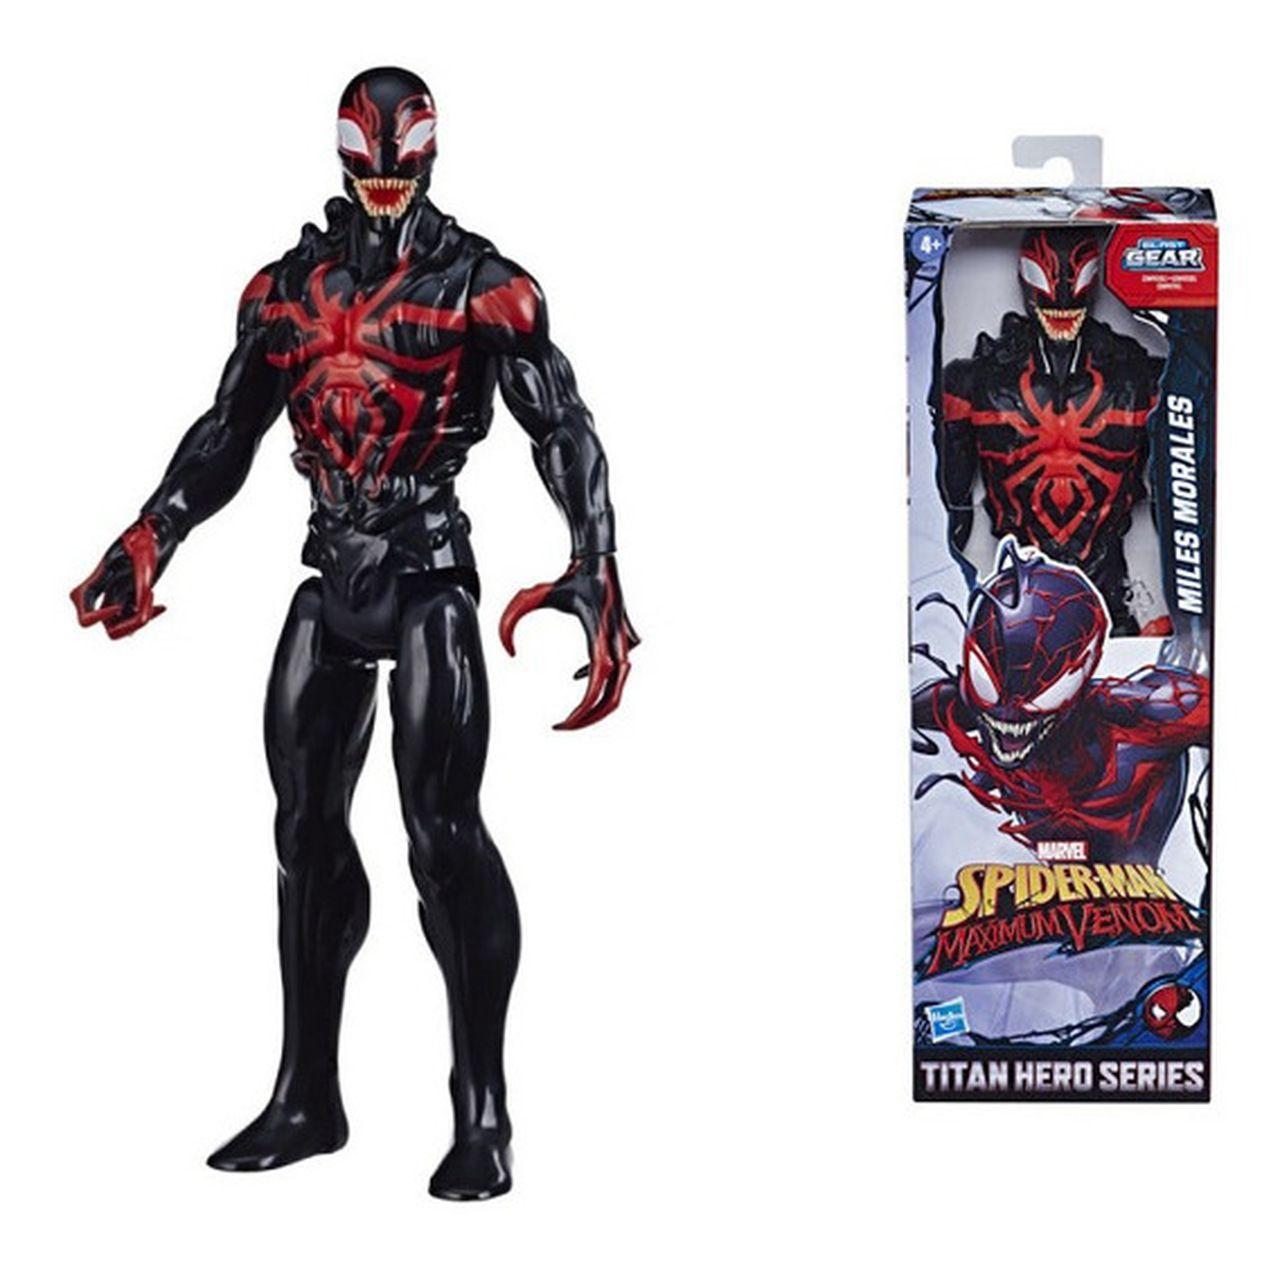 Boneco Homem Aranha Venom Miles Morales Blast Gear - Hasbro